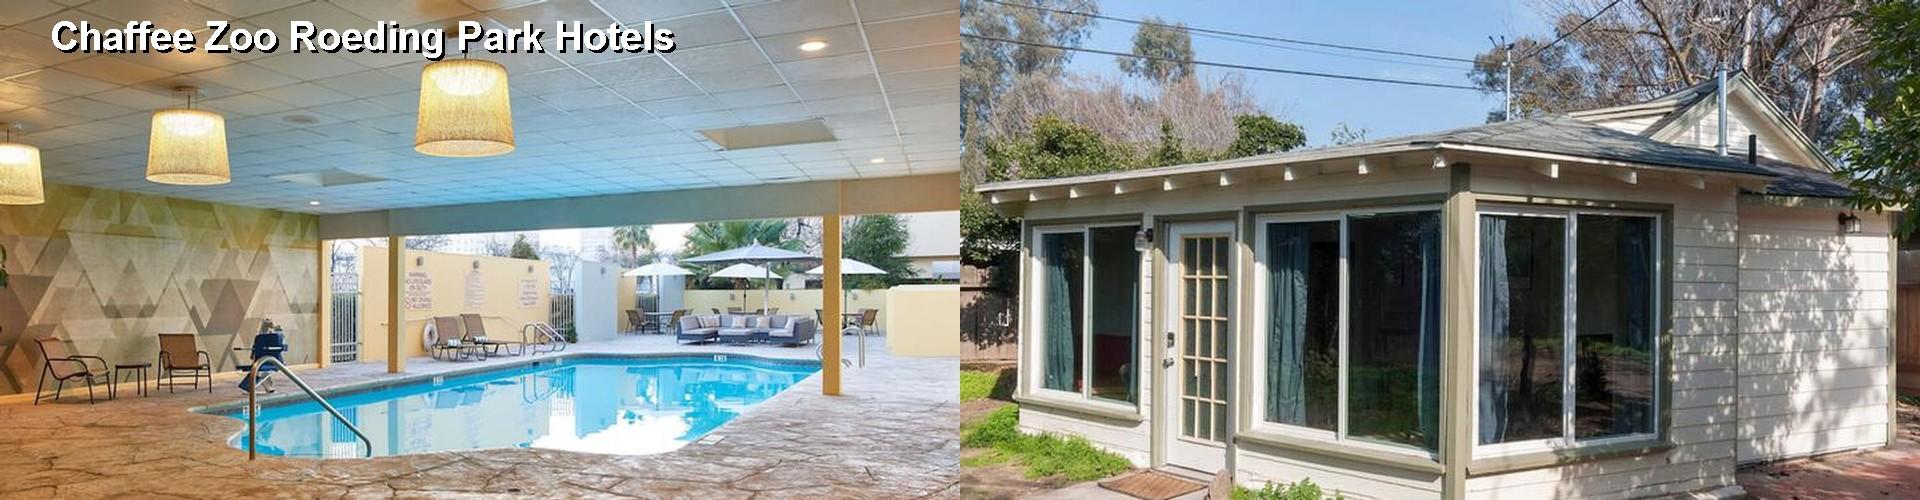 43 Hotels Near Chaffee Zoo Roeding Park In Fresno Ca